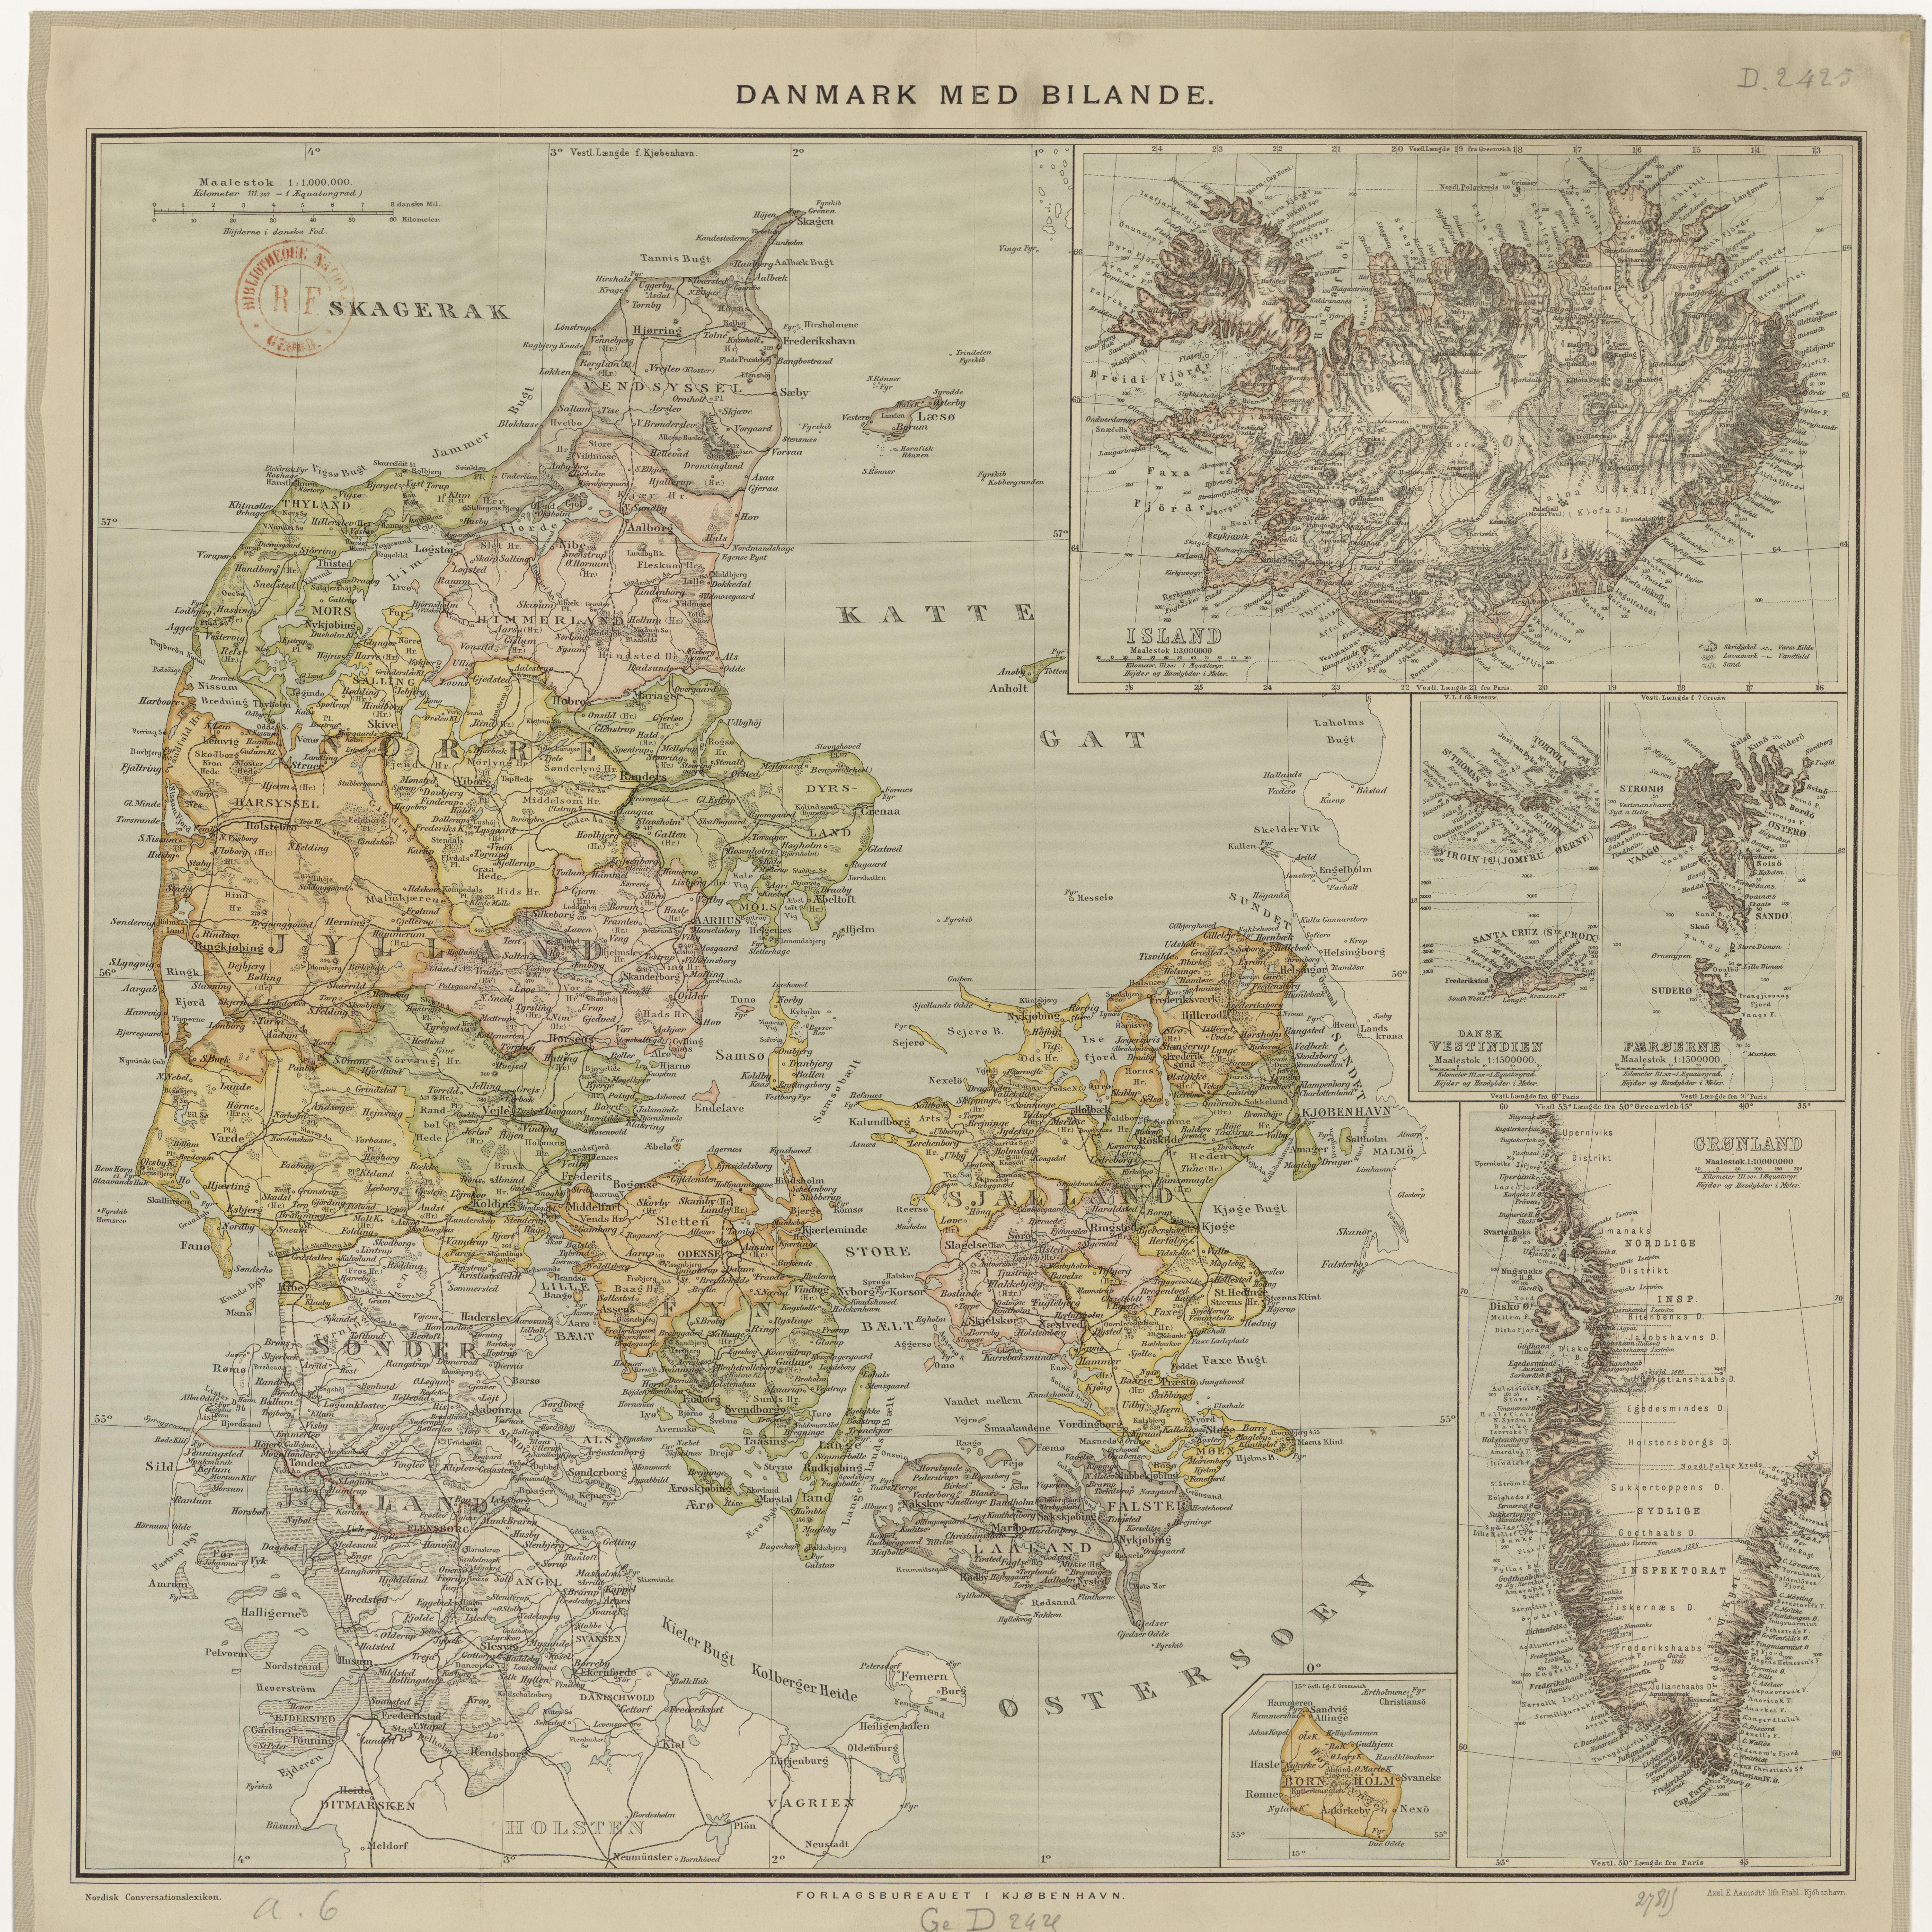 Datei:Danmark med bilande - Map of Denmark 19th century.jpg – Wikipedia